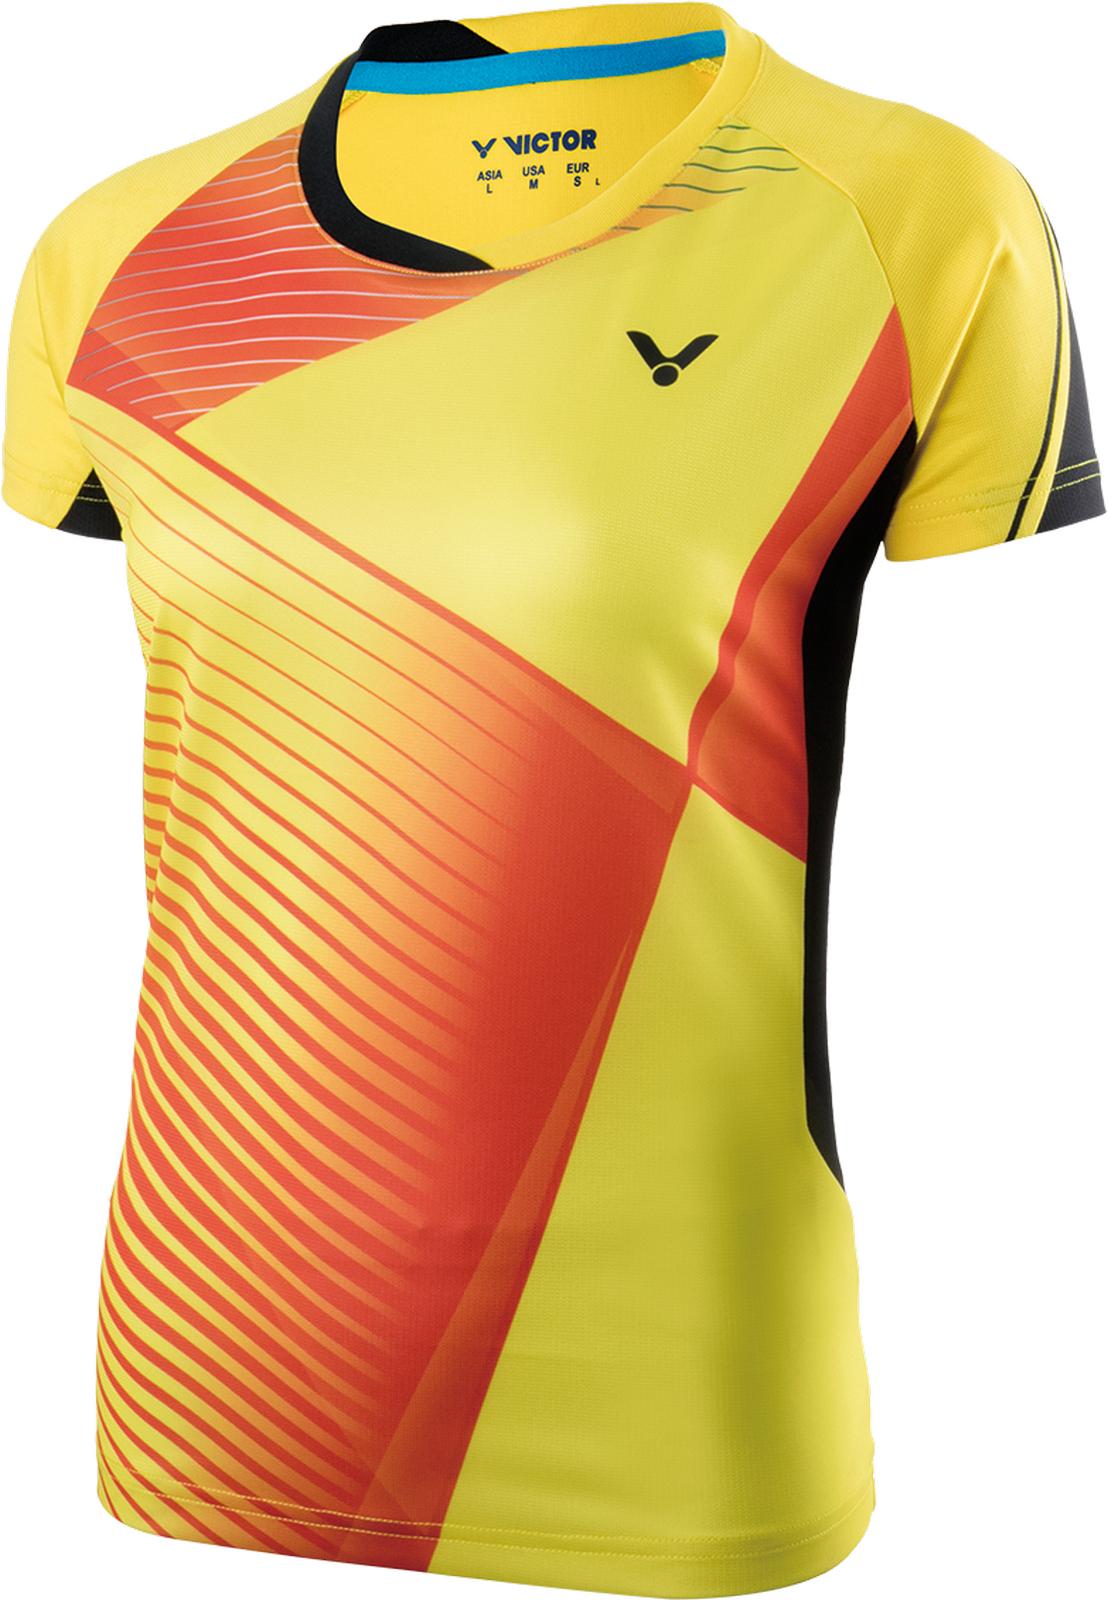 Victor Shirt Games Frau gelb